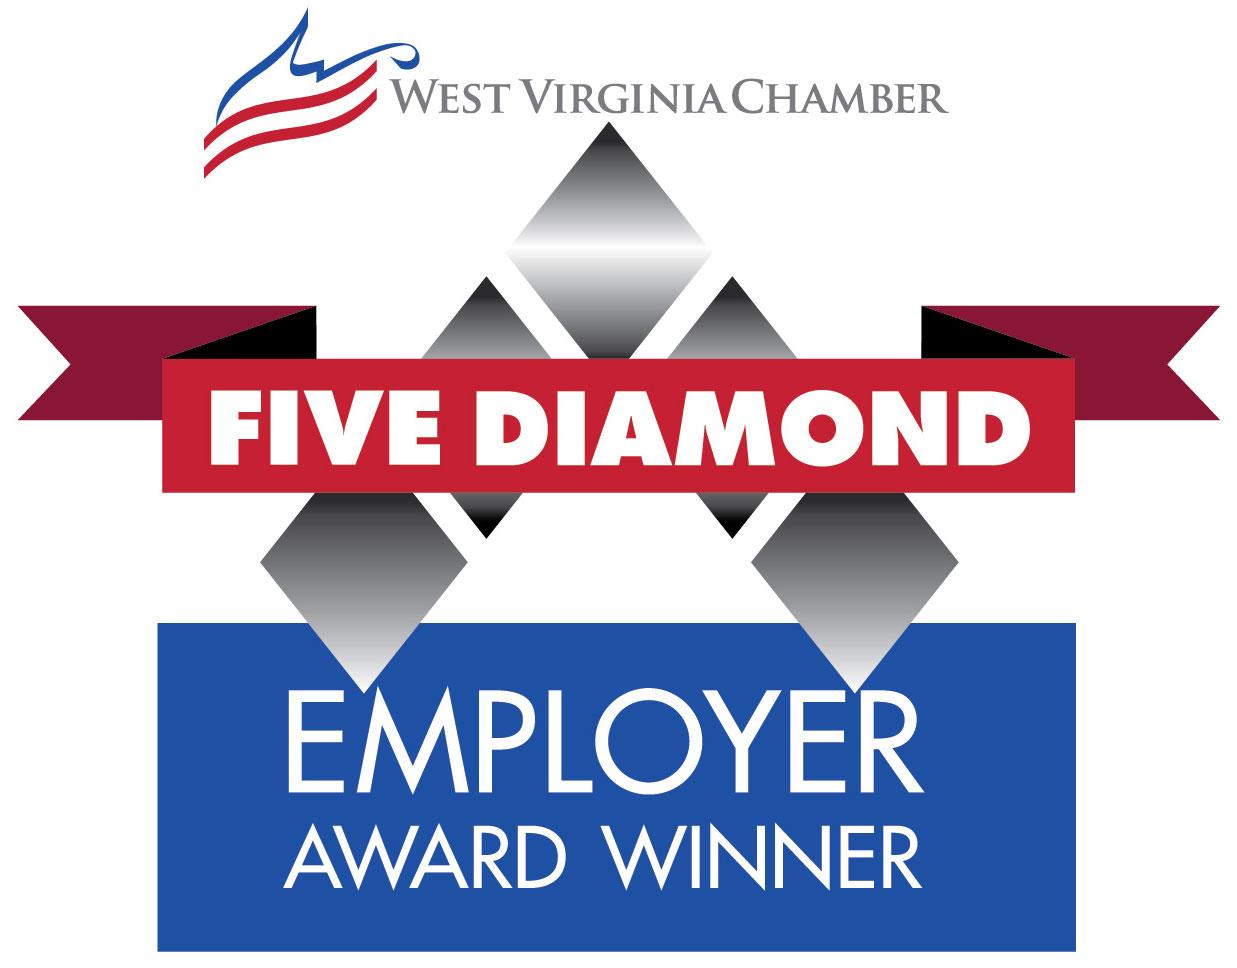 Five Diamond Employee Award Winner